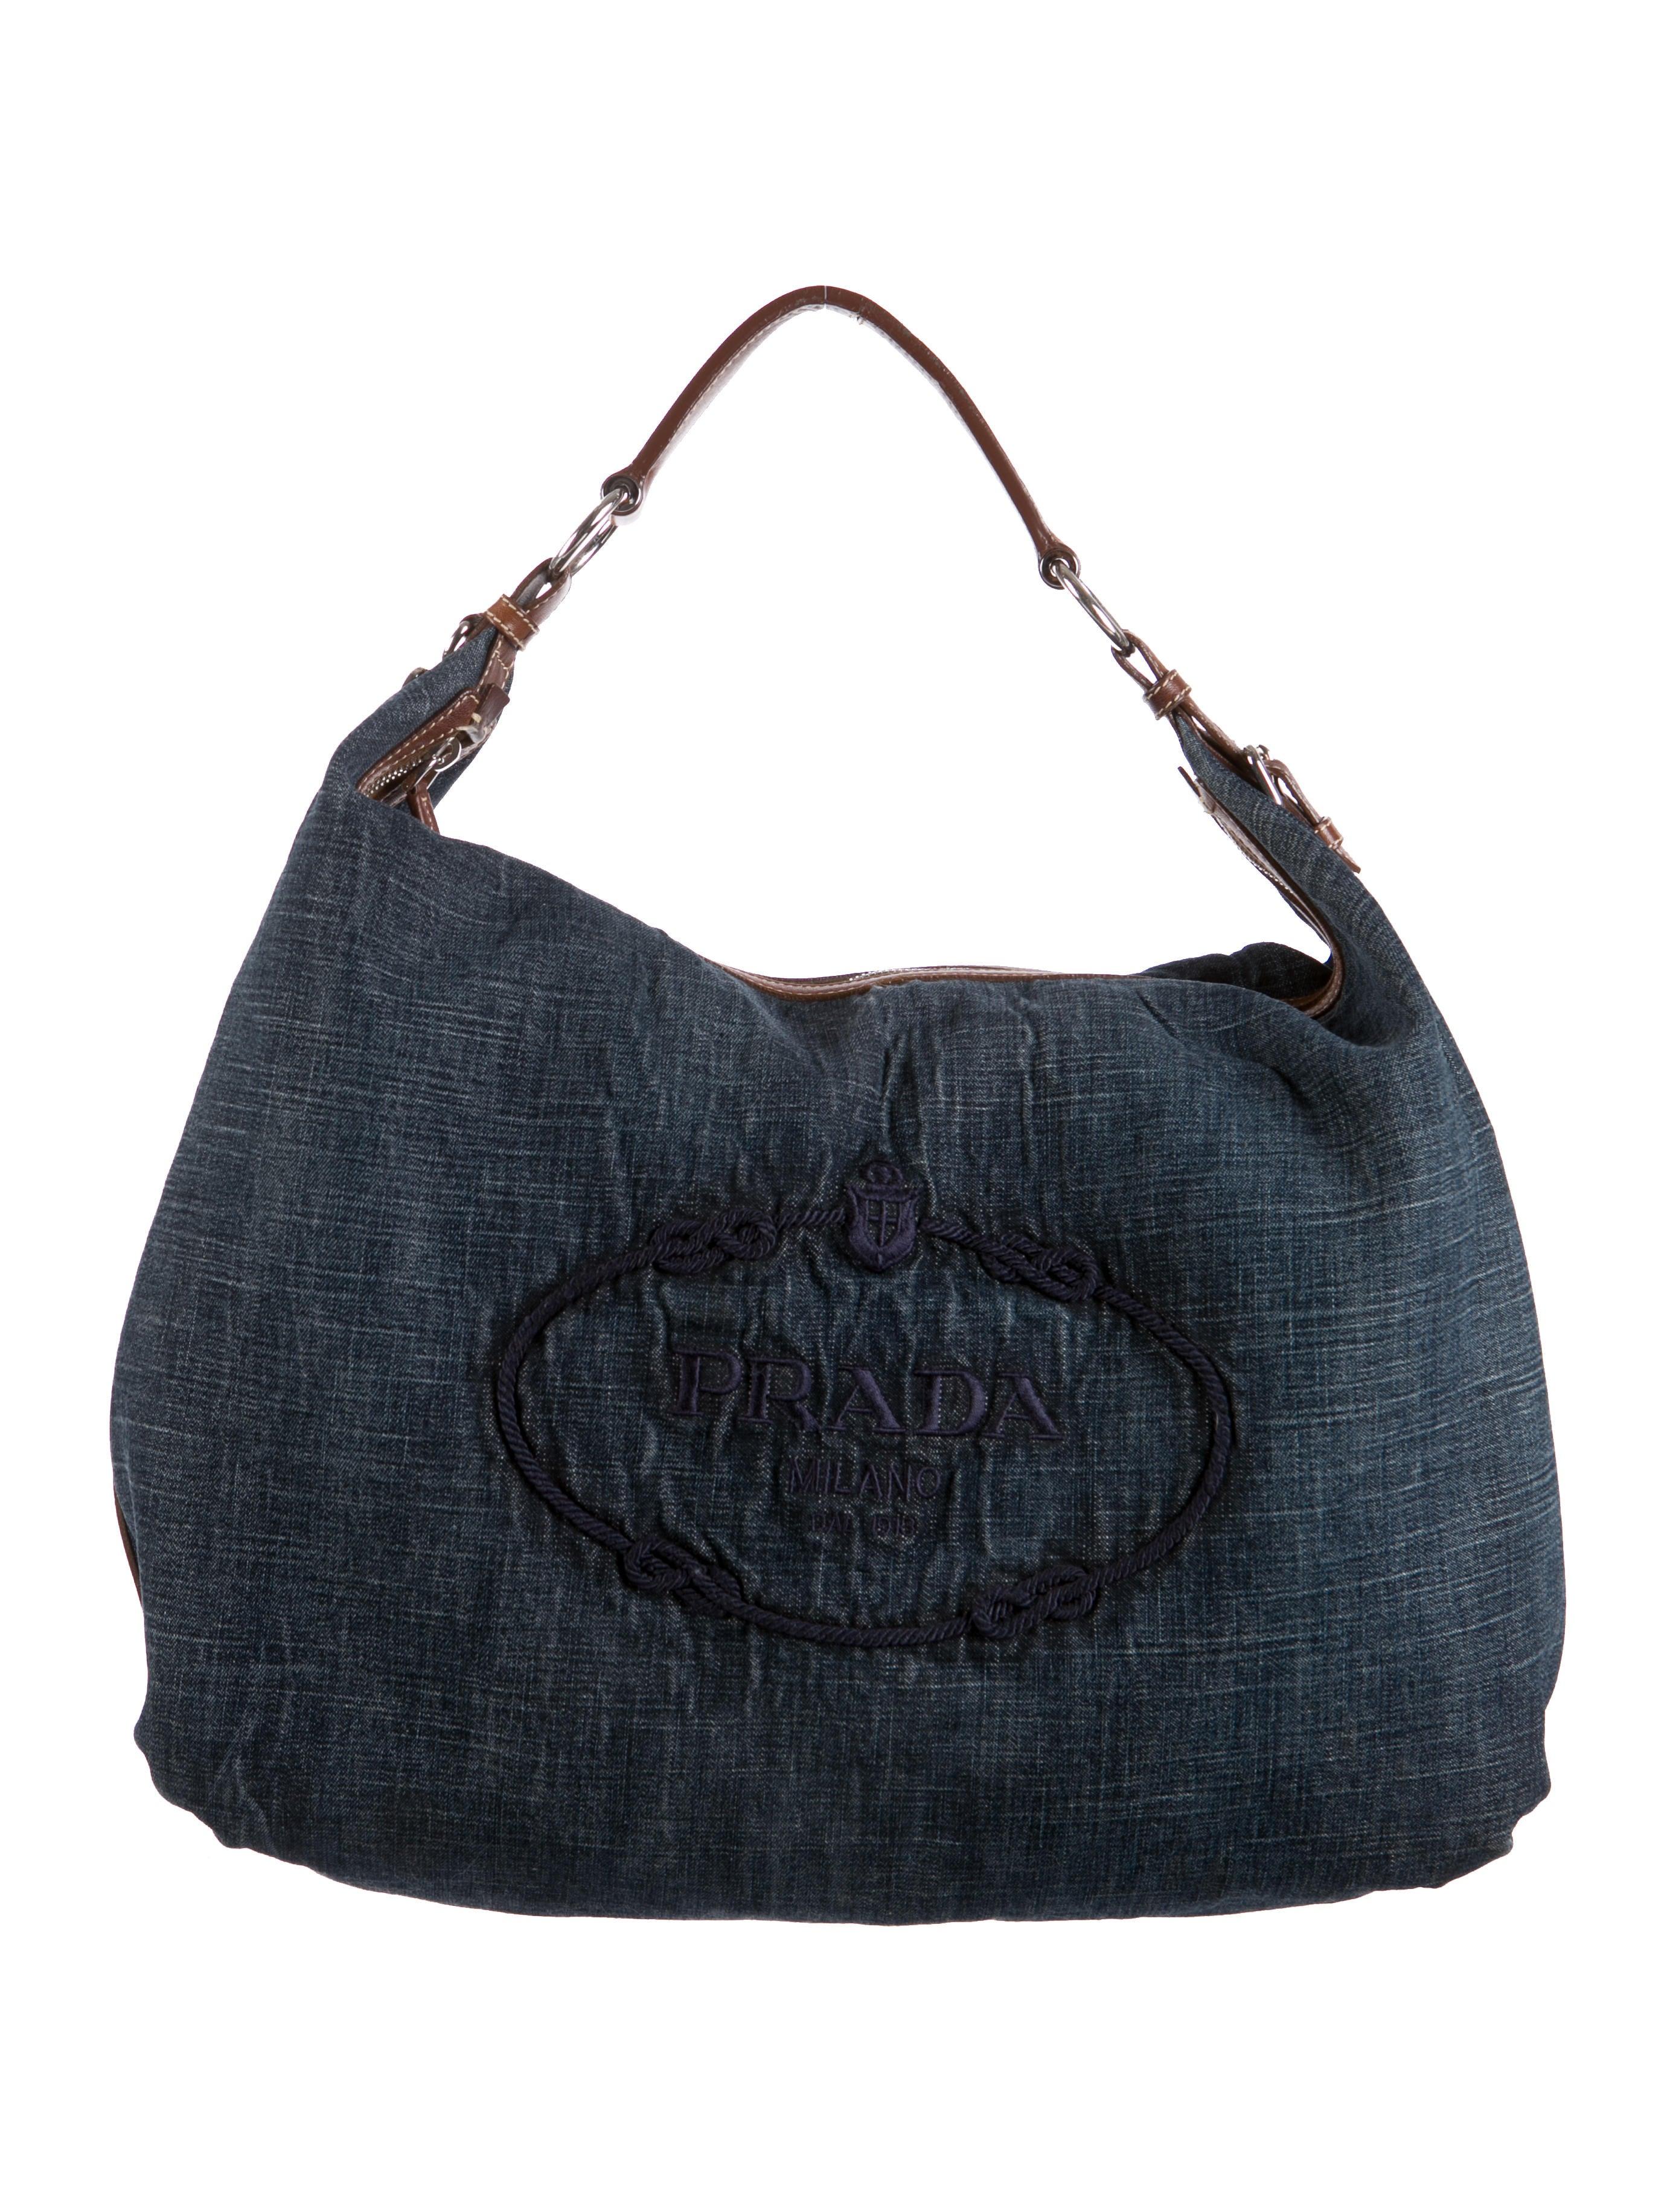 Prada Denim Logo Tote - Handbags - PRA83178 | The RealReal